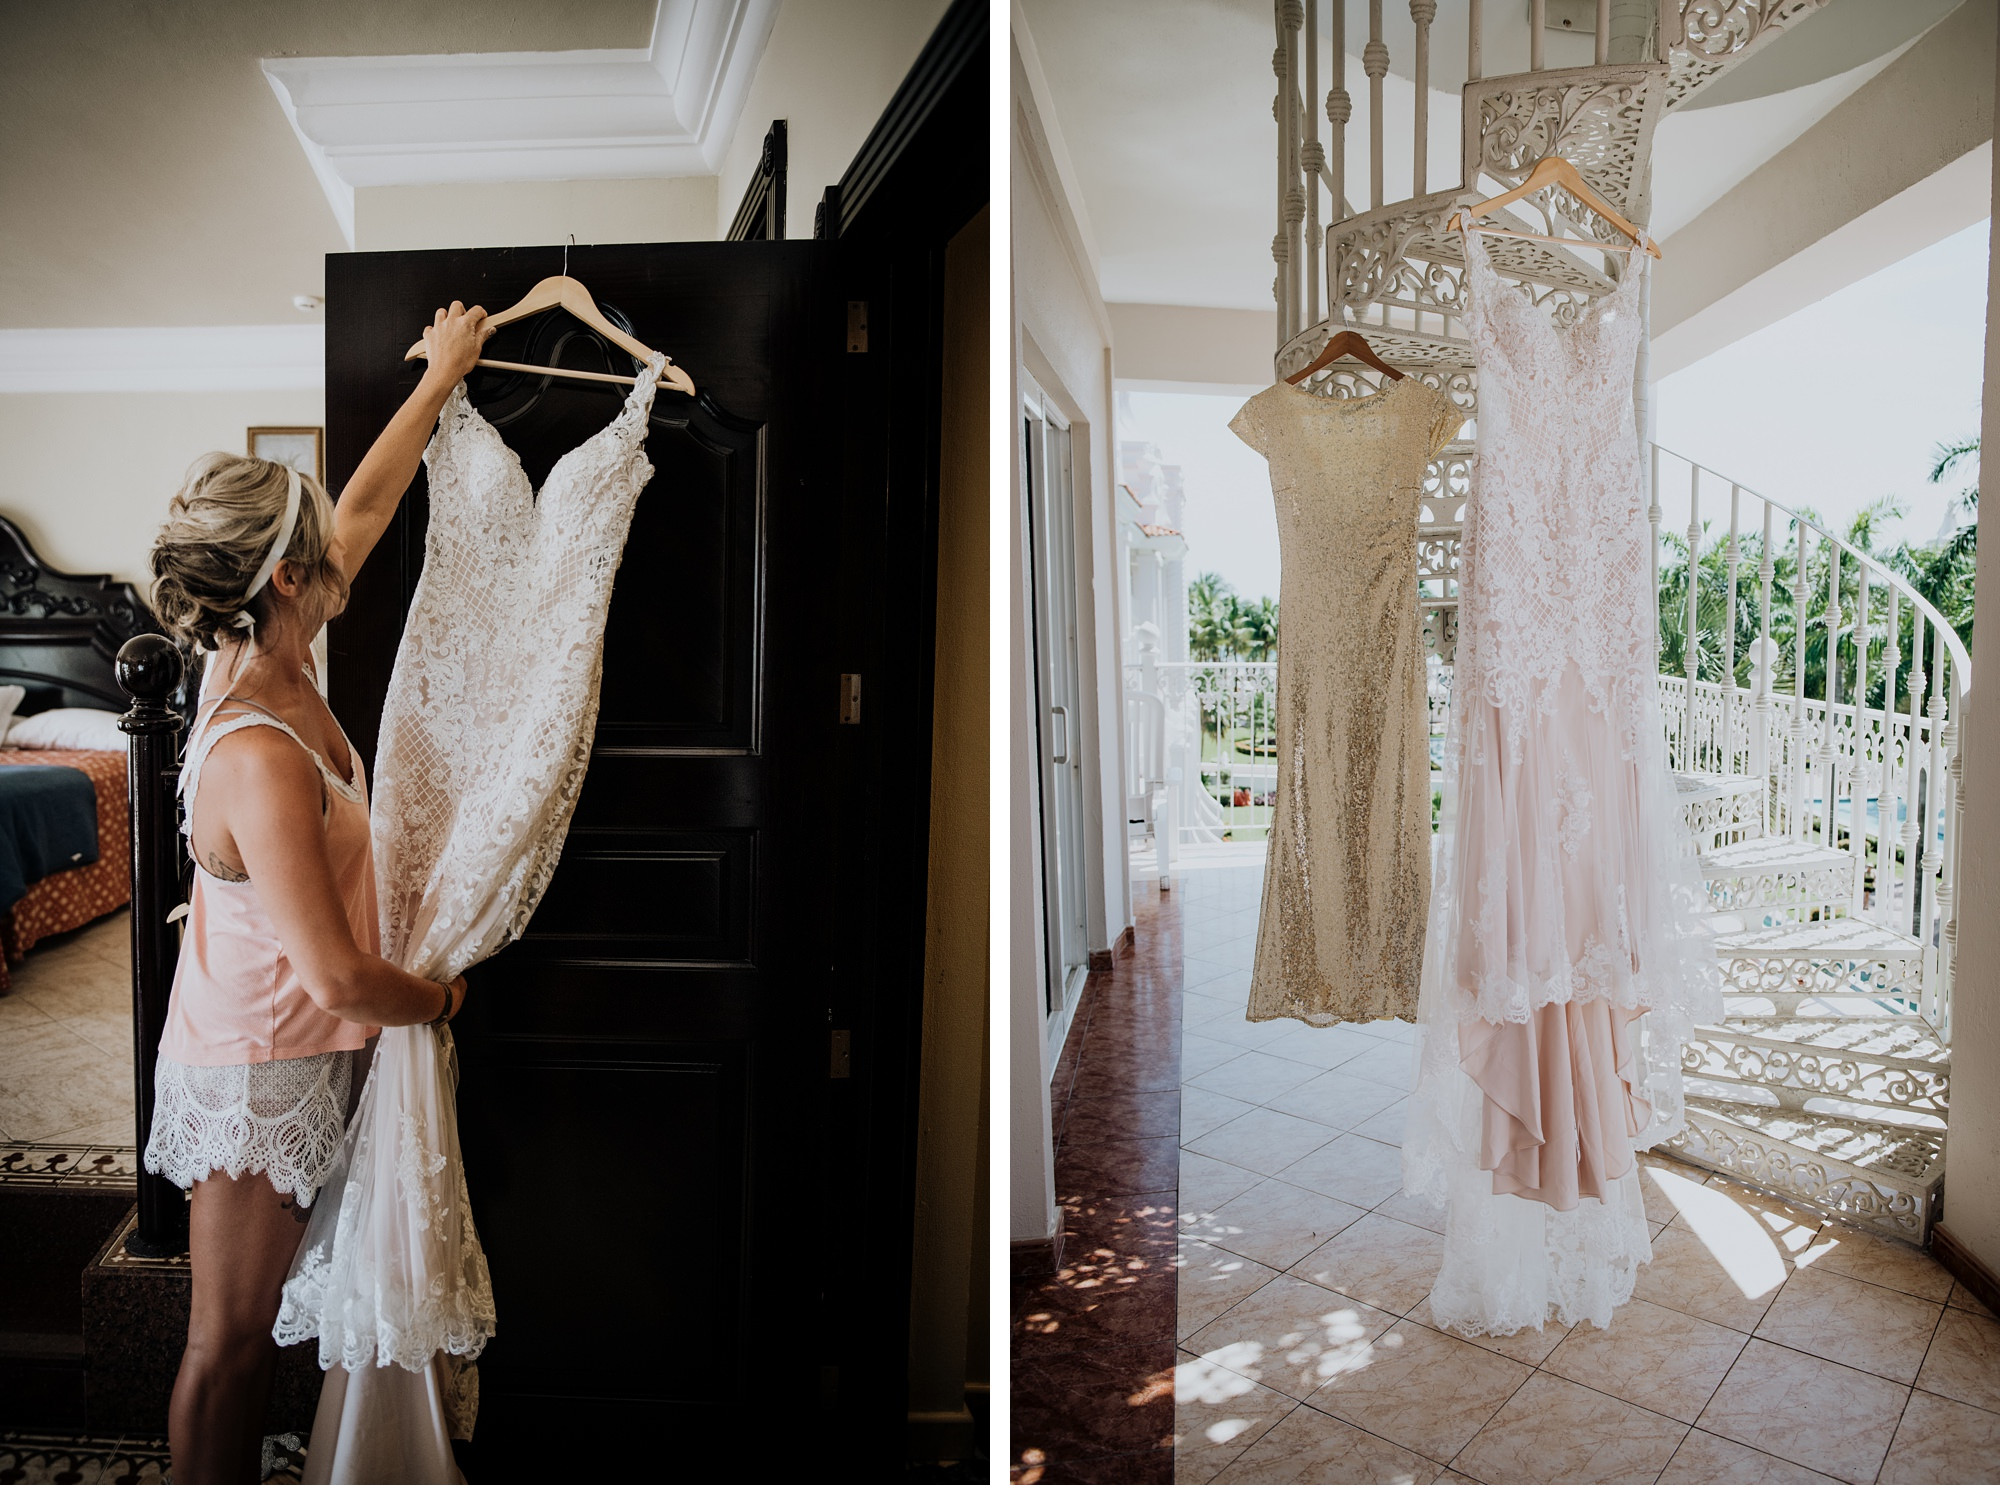 bride hanging wedding dress playa del carmen wedding